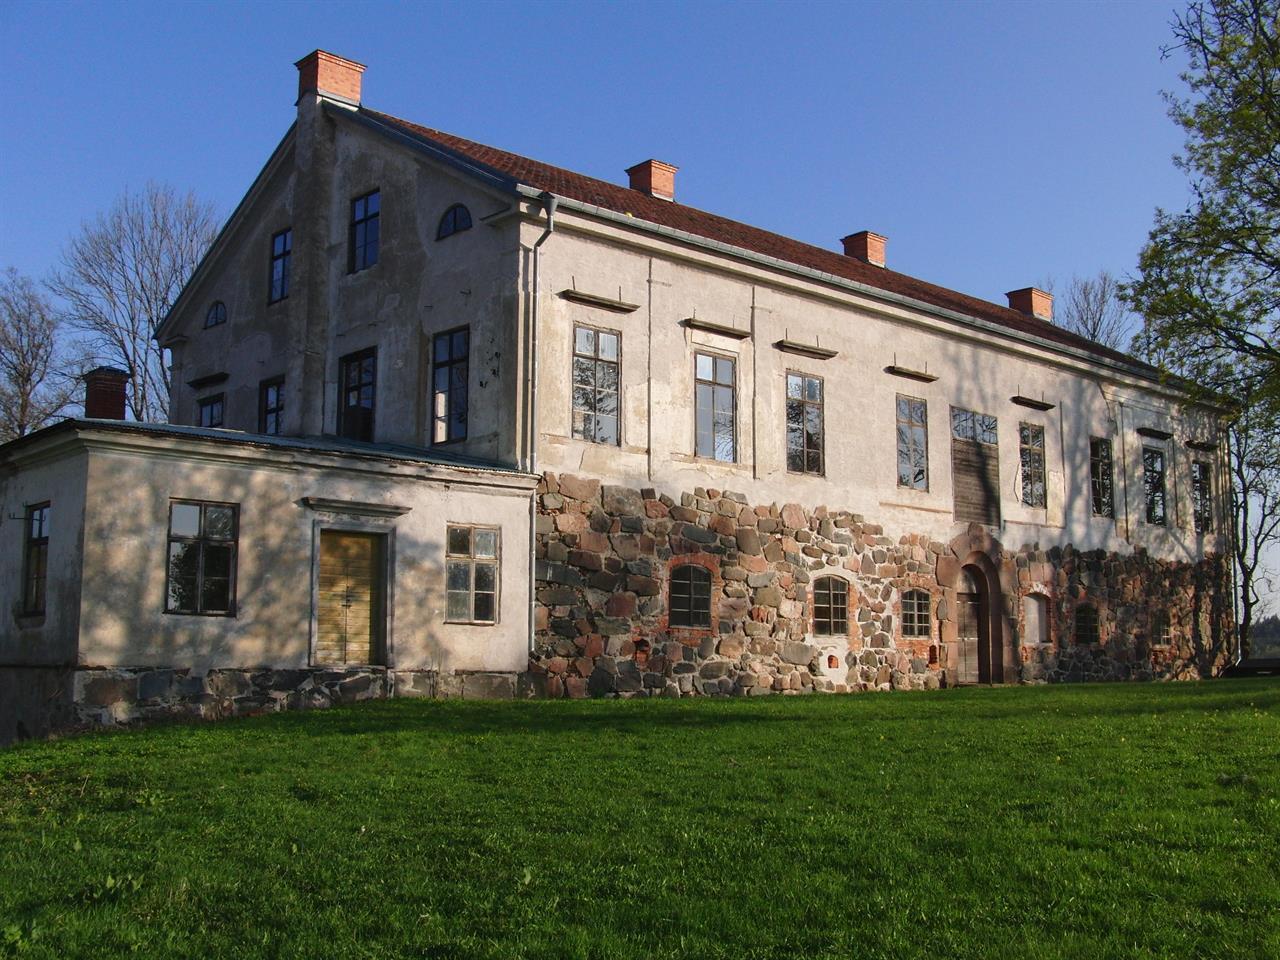 Vinäs Slott